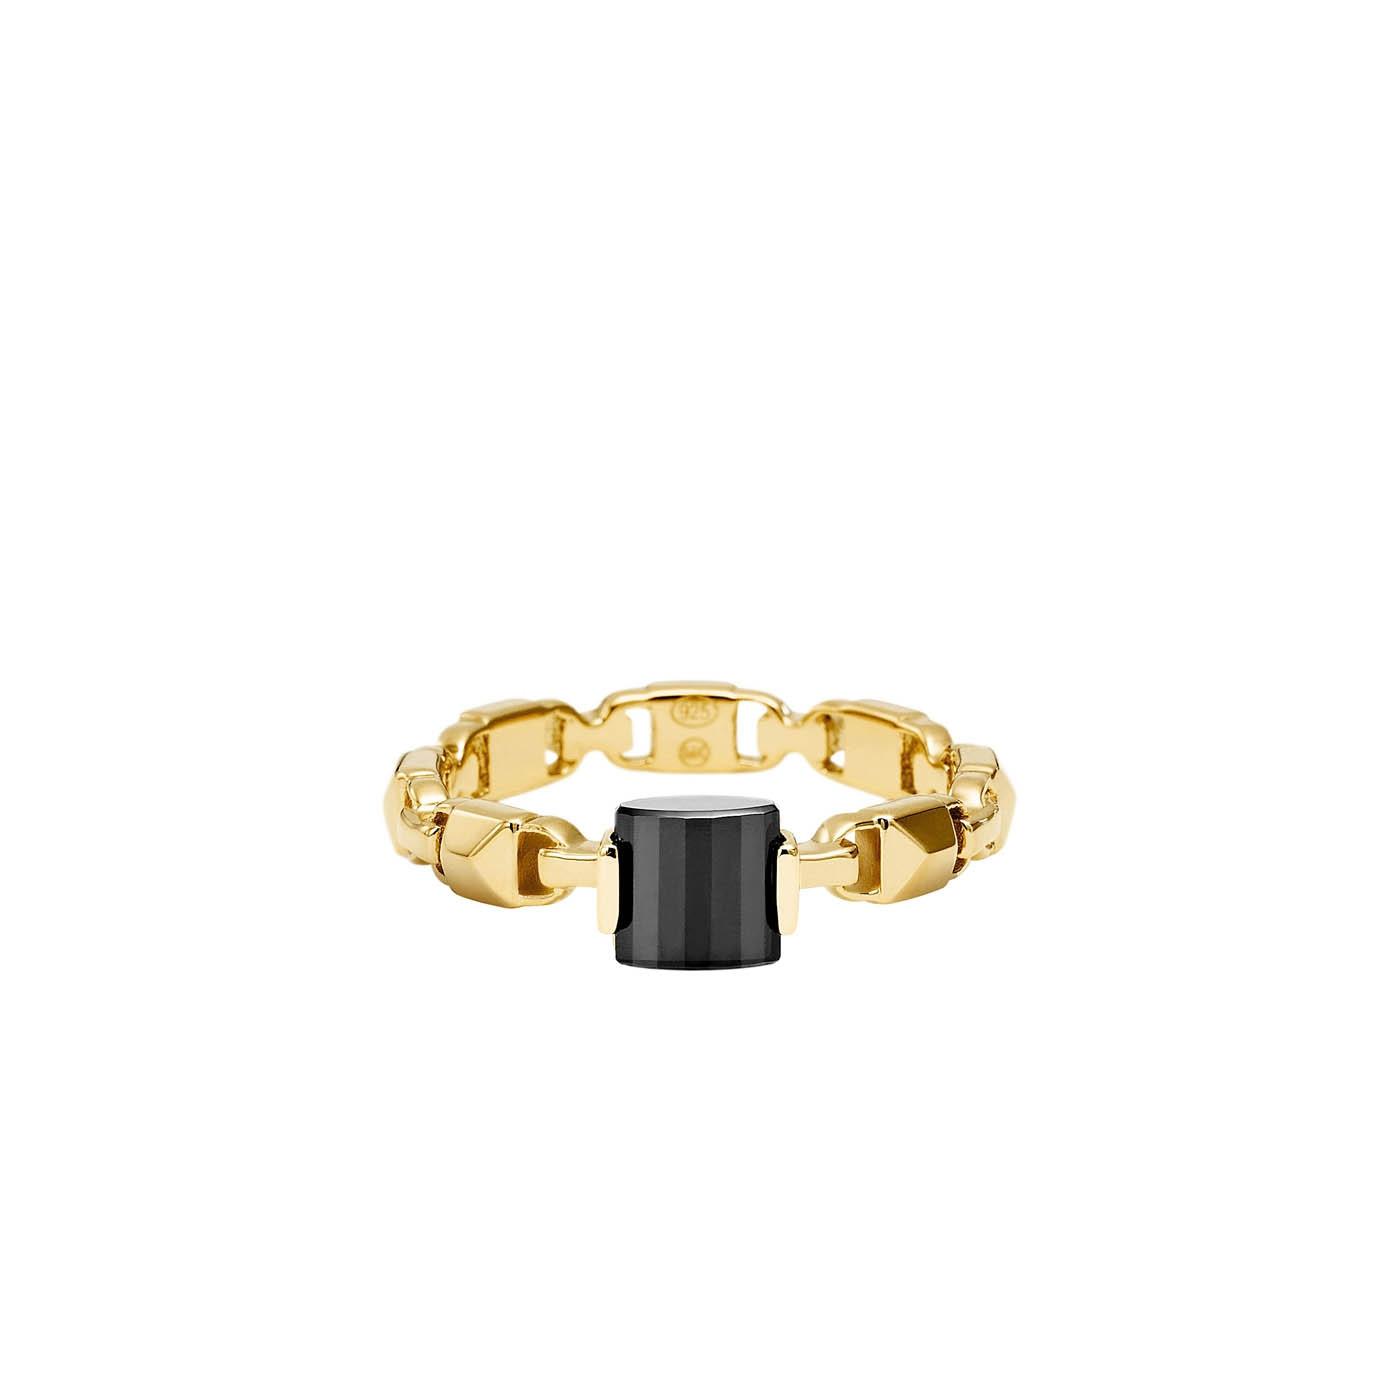 925 STERLING ZILVEREN GOUDKLEURIGE/ZWARTE MERCER LINK RING MKC1026AM710